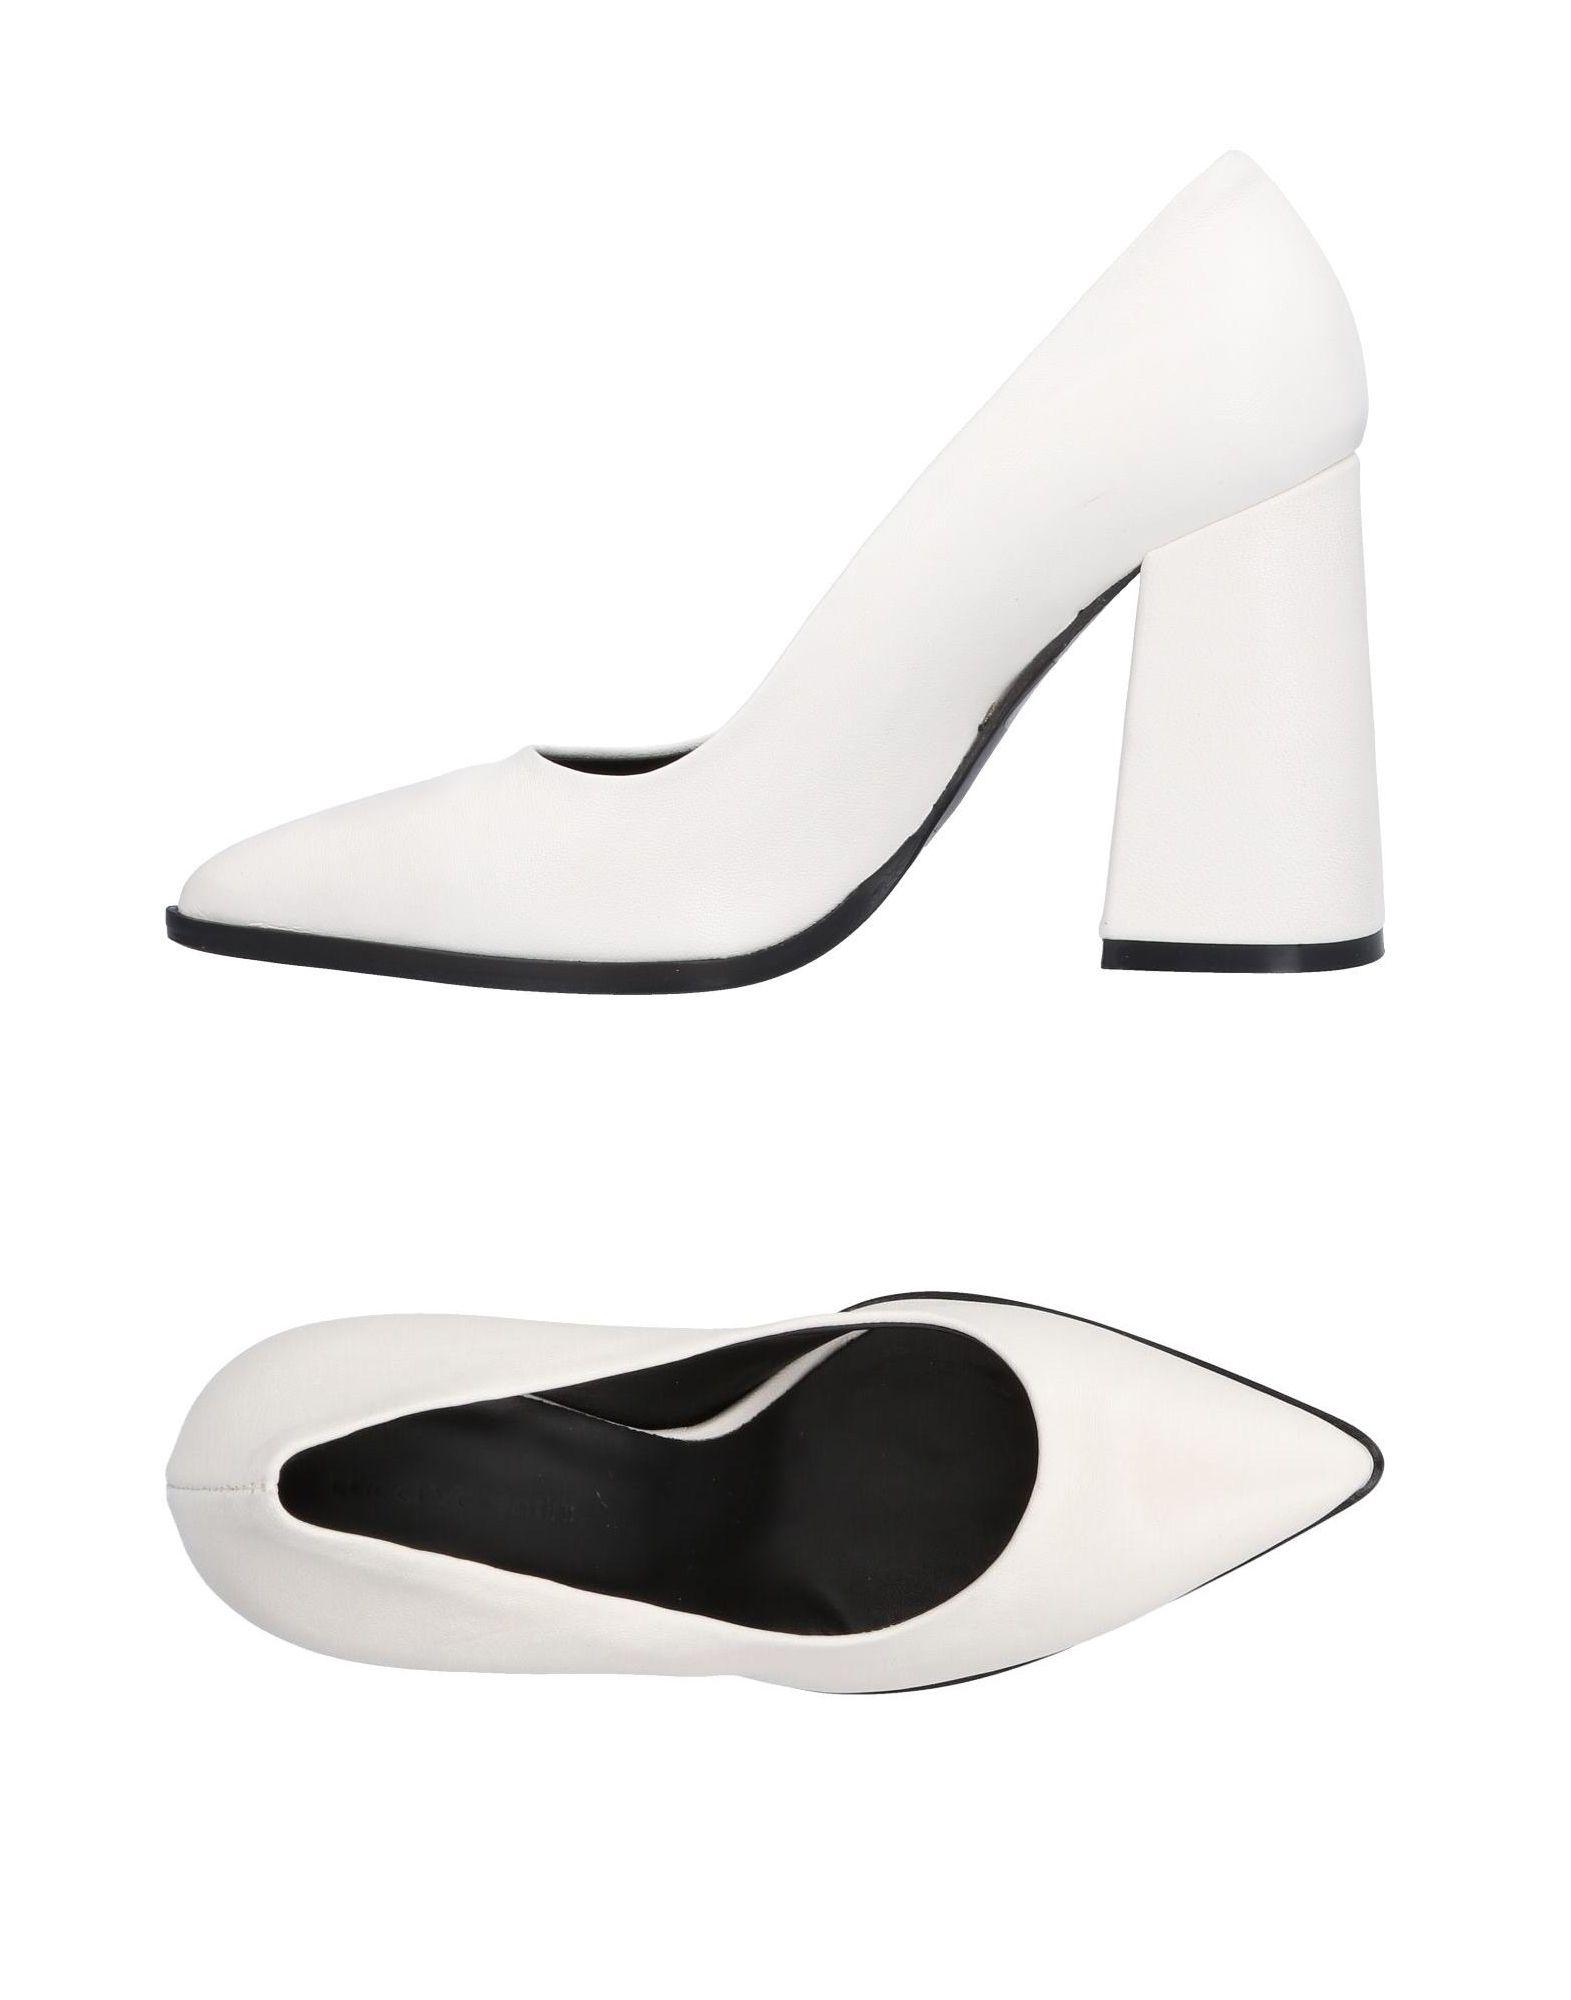 Stilvolle billige Pumps Schuhe Luca Valentini Pumps billige Damen  11498790CA 1cbec7